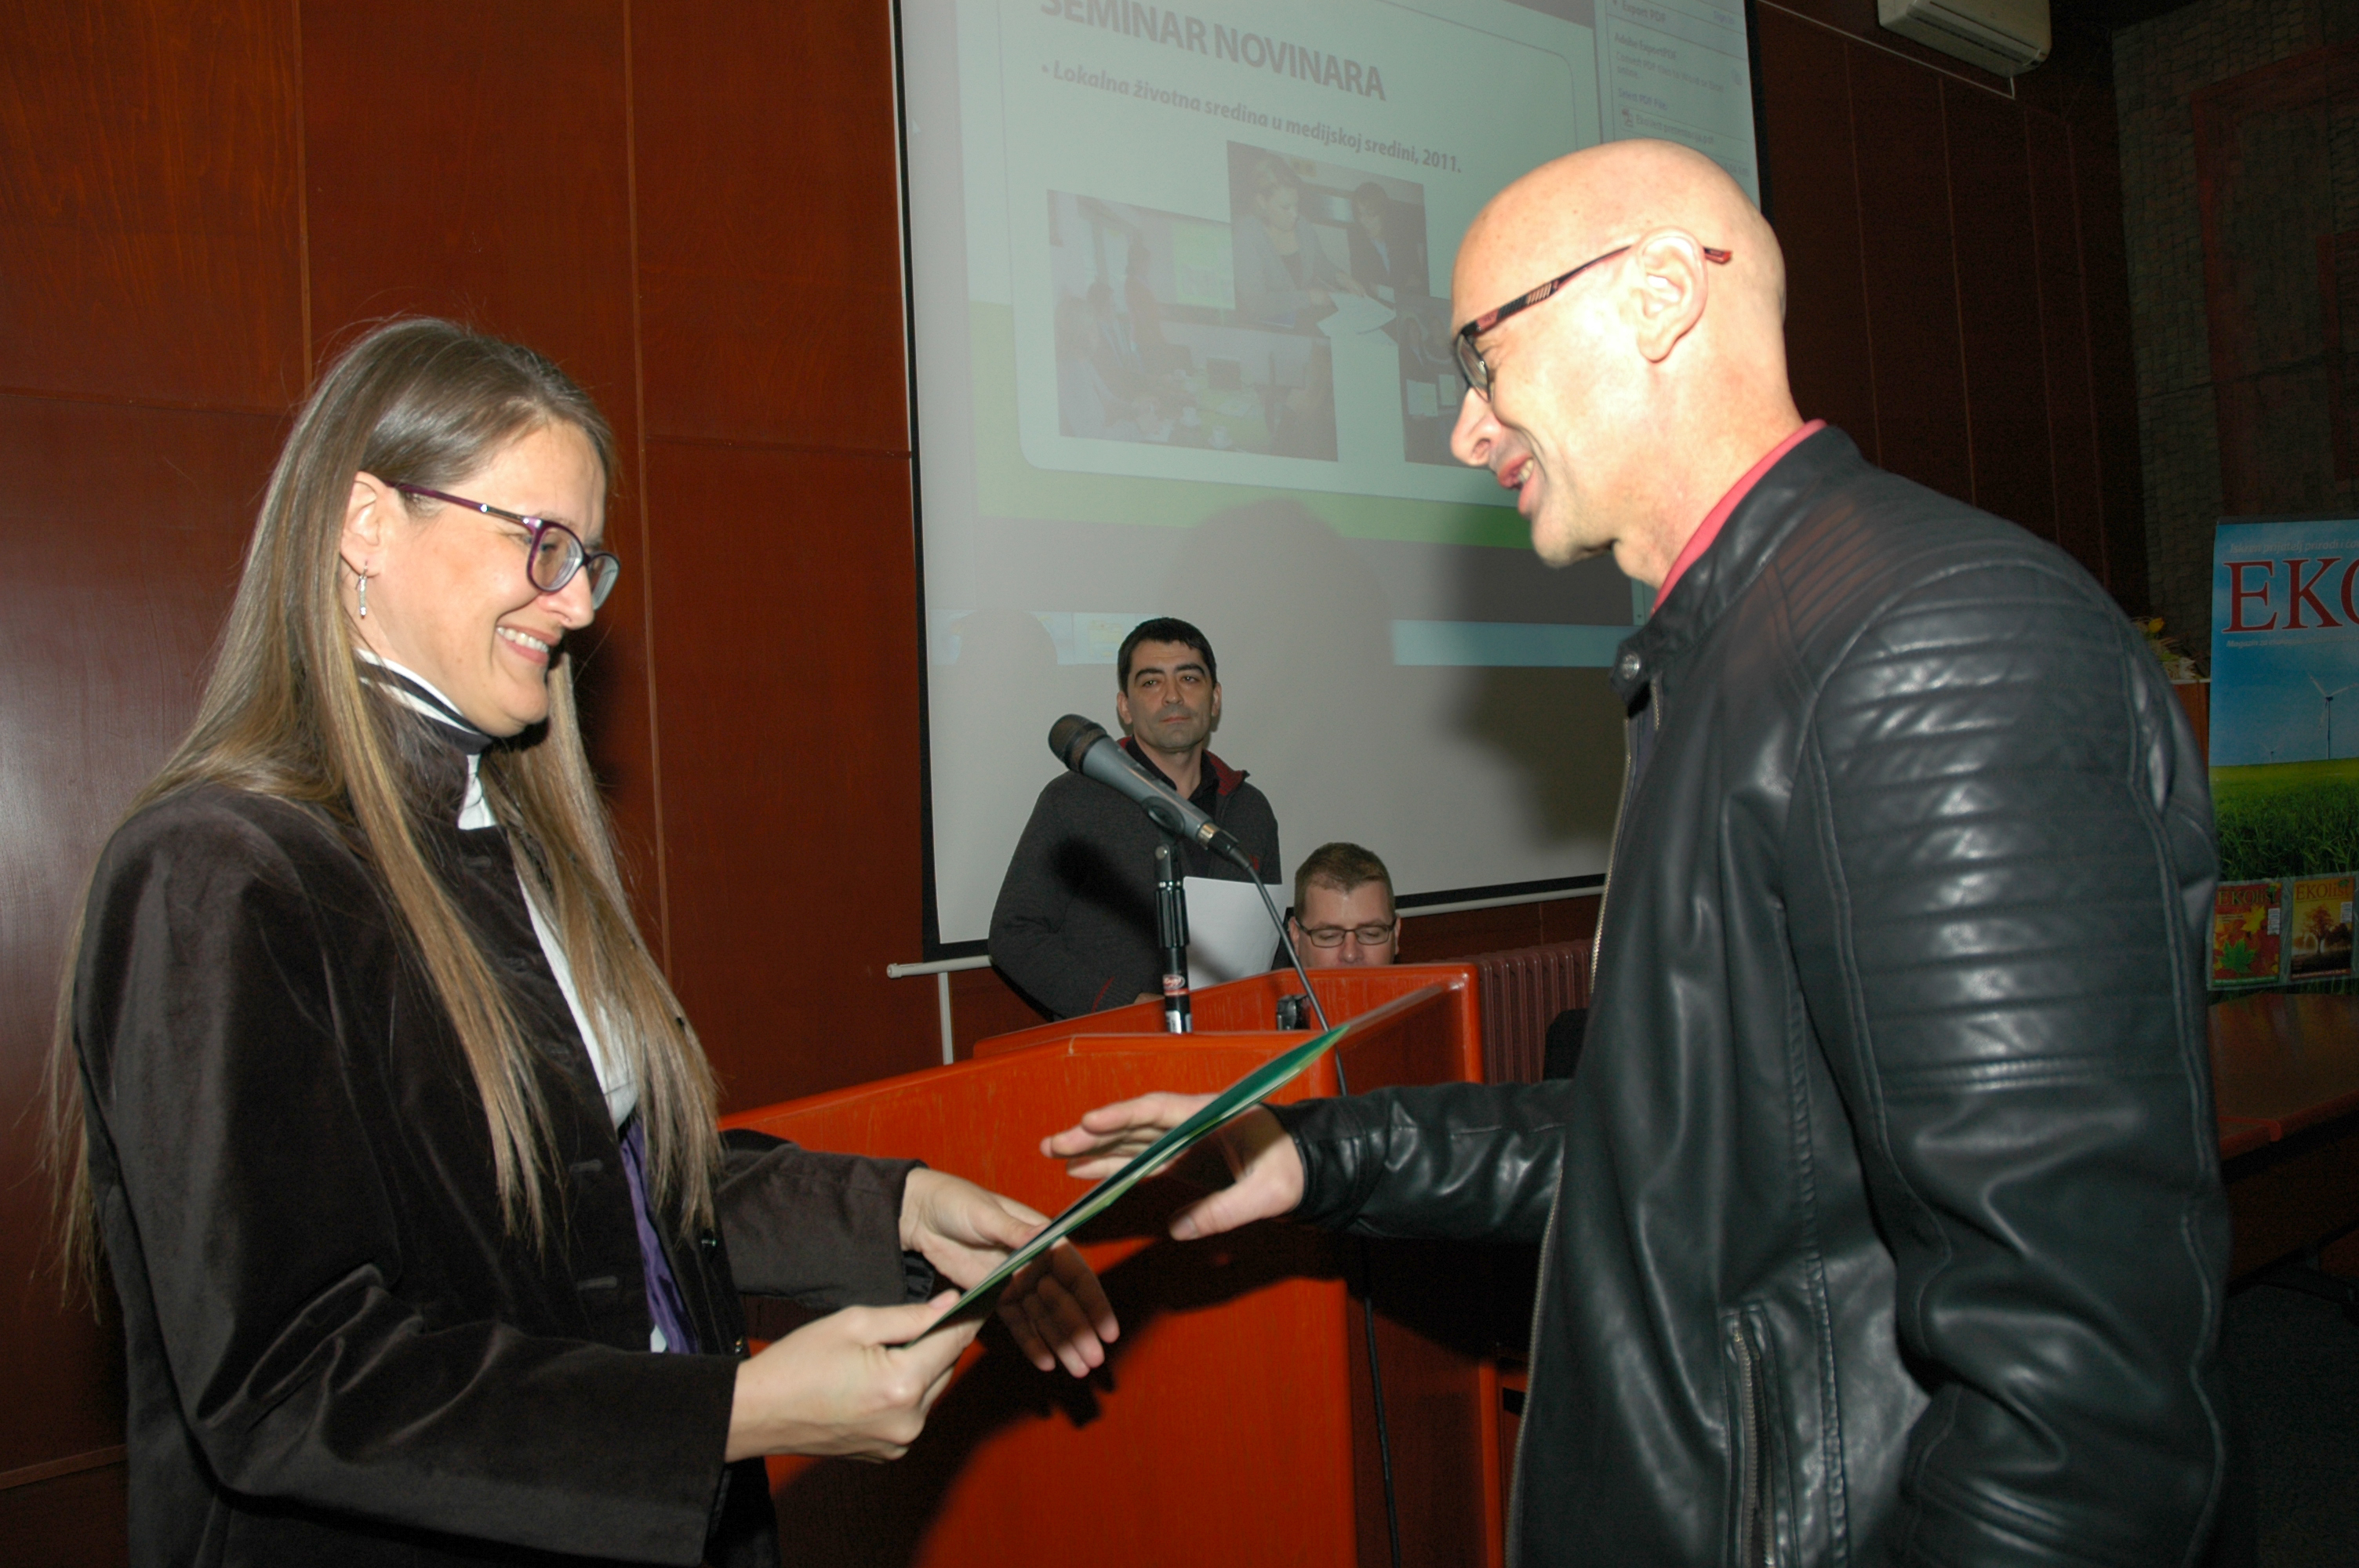 Uručenje priznanja ekologu, Ratku Đurđevac. Foto: Miloš Ćirković.